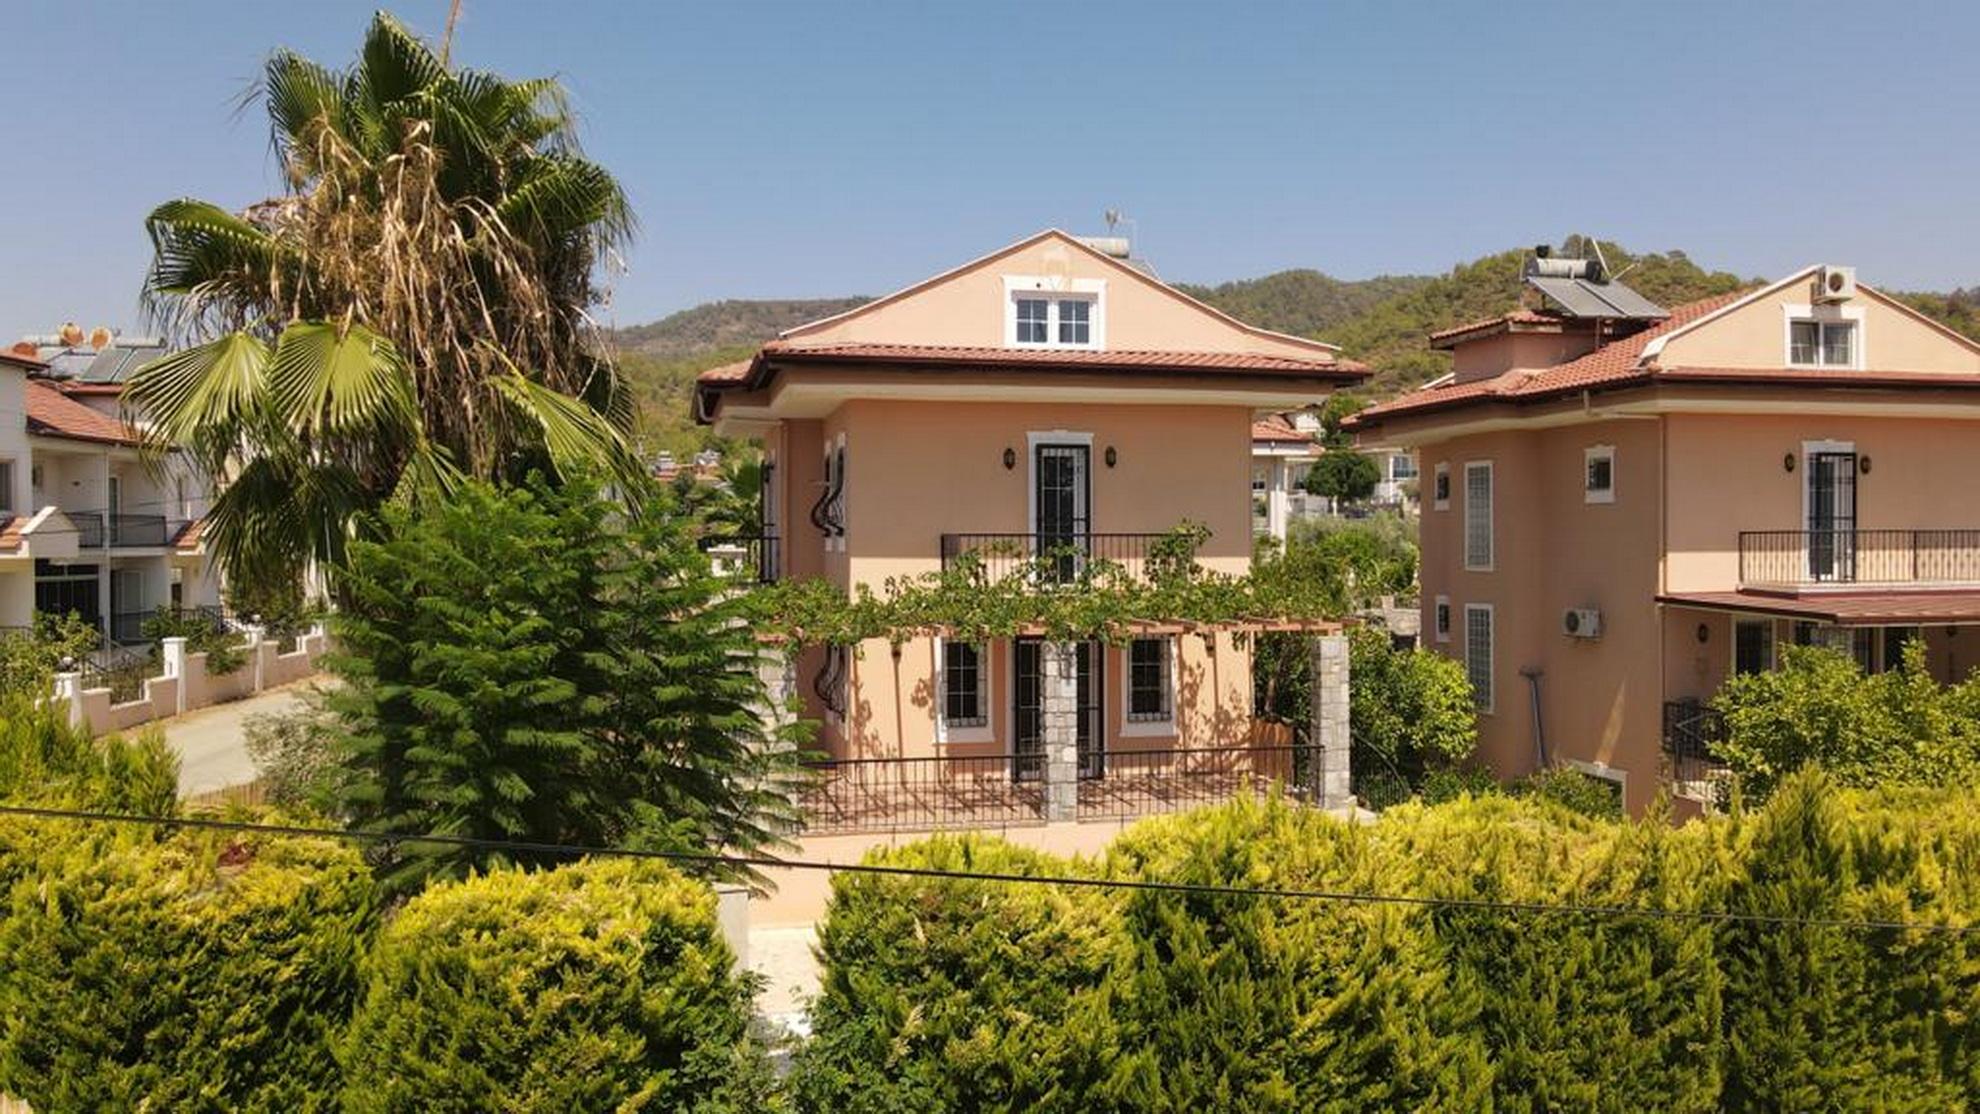 5 Bedroom Detached Villa with Private Garden & Pool